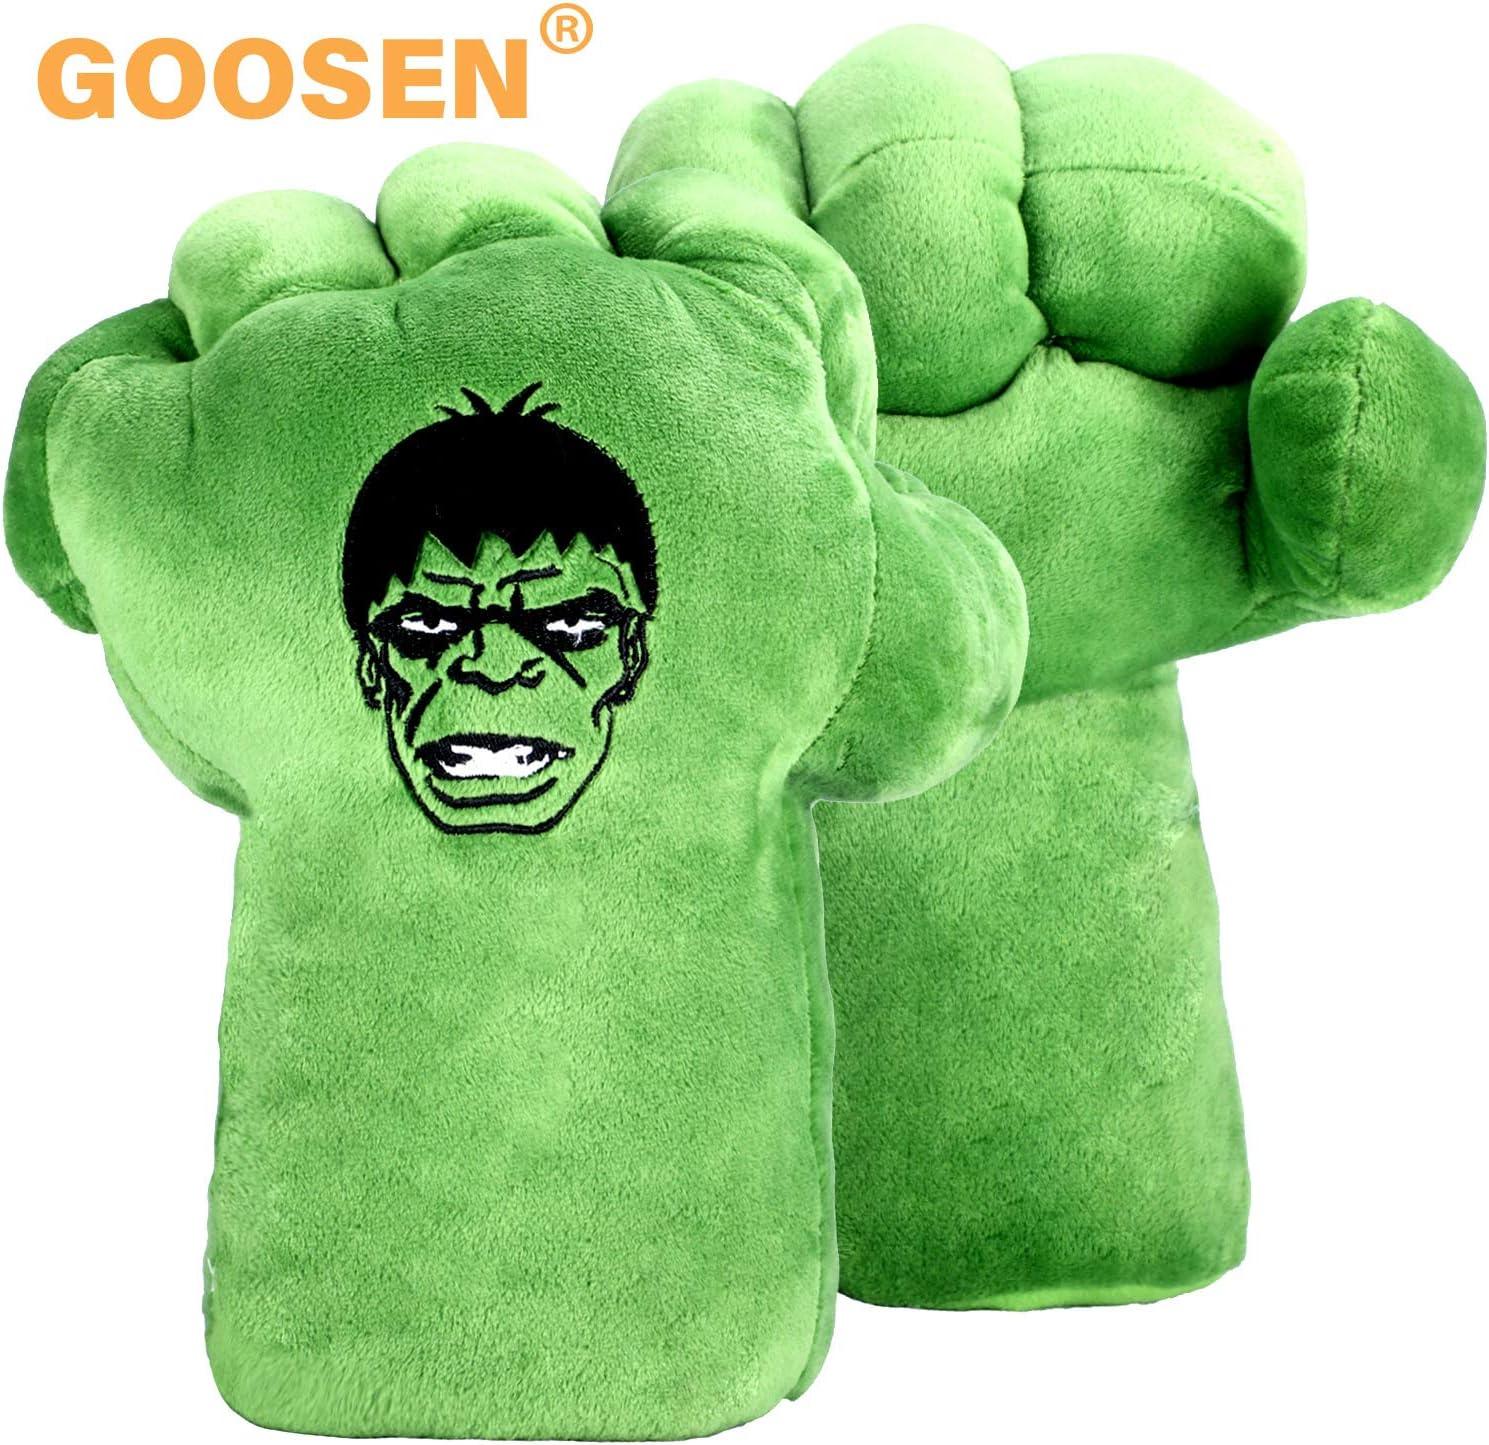 GOOSEN78 Hulk Hands Gloves for Kids, Hulk Cosplay Costume Accessories, Hulk Toy (1 Pair)